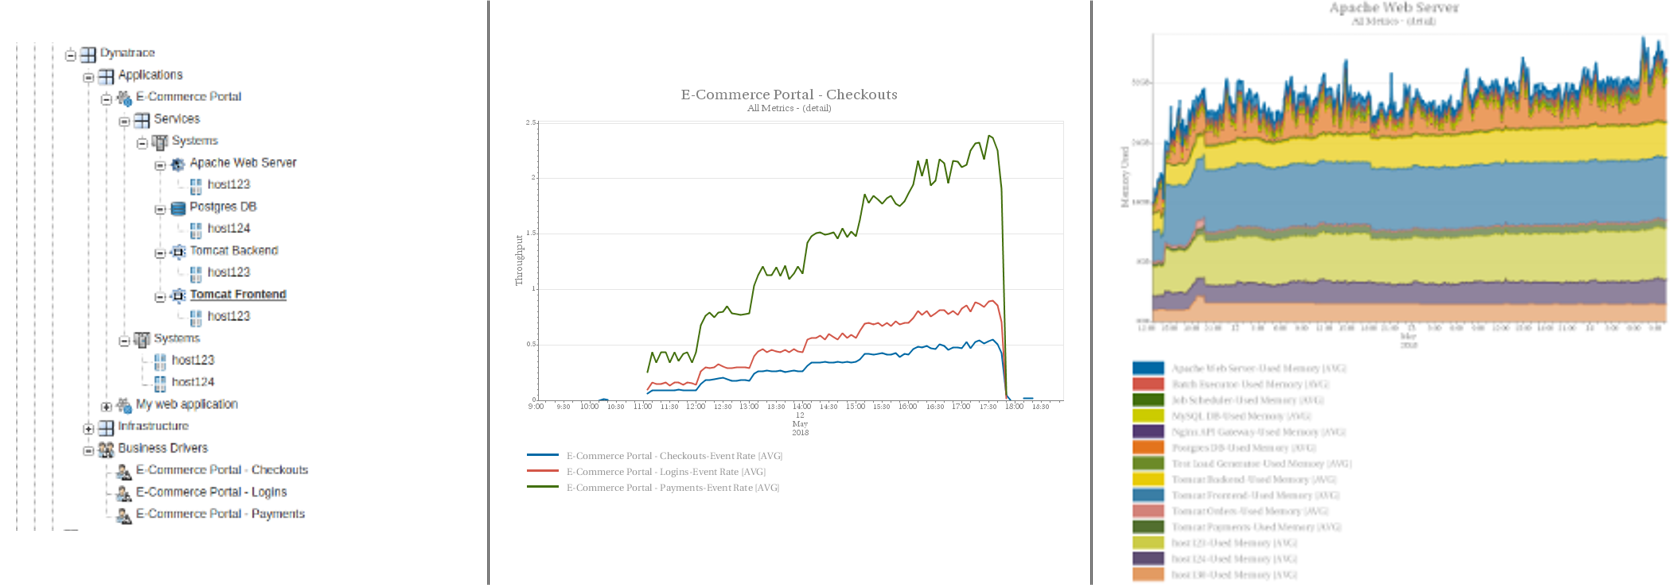 11 3 01 enhancements - Documentation for BMC TrueSight Capacity